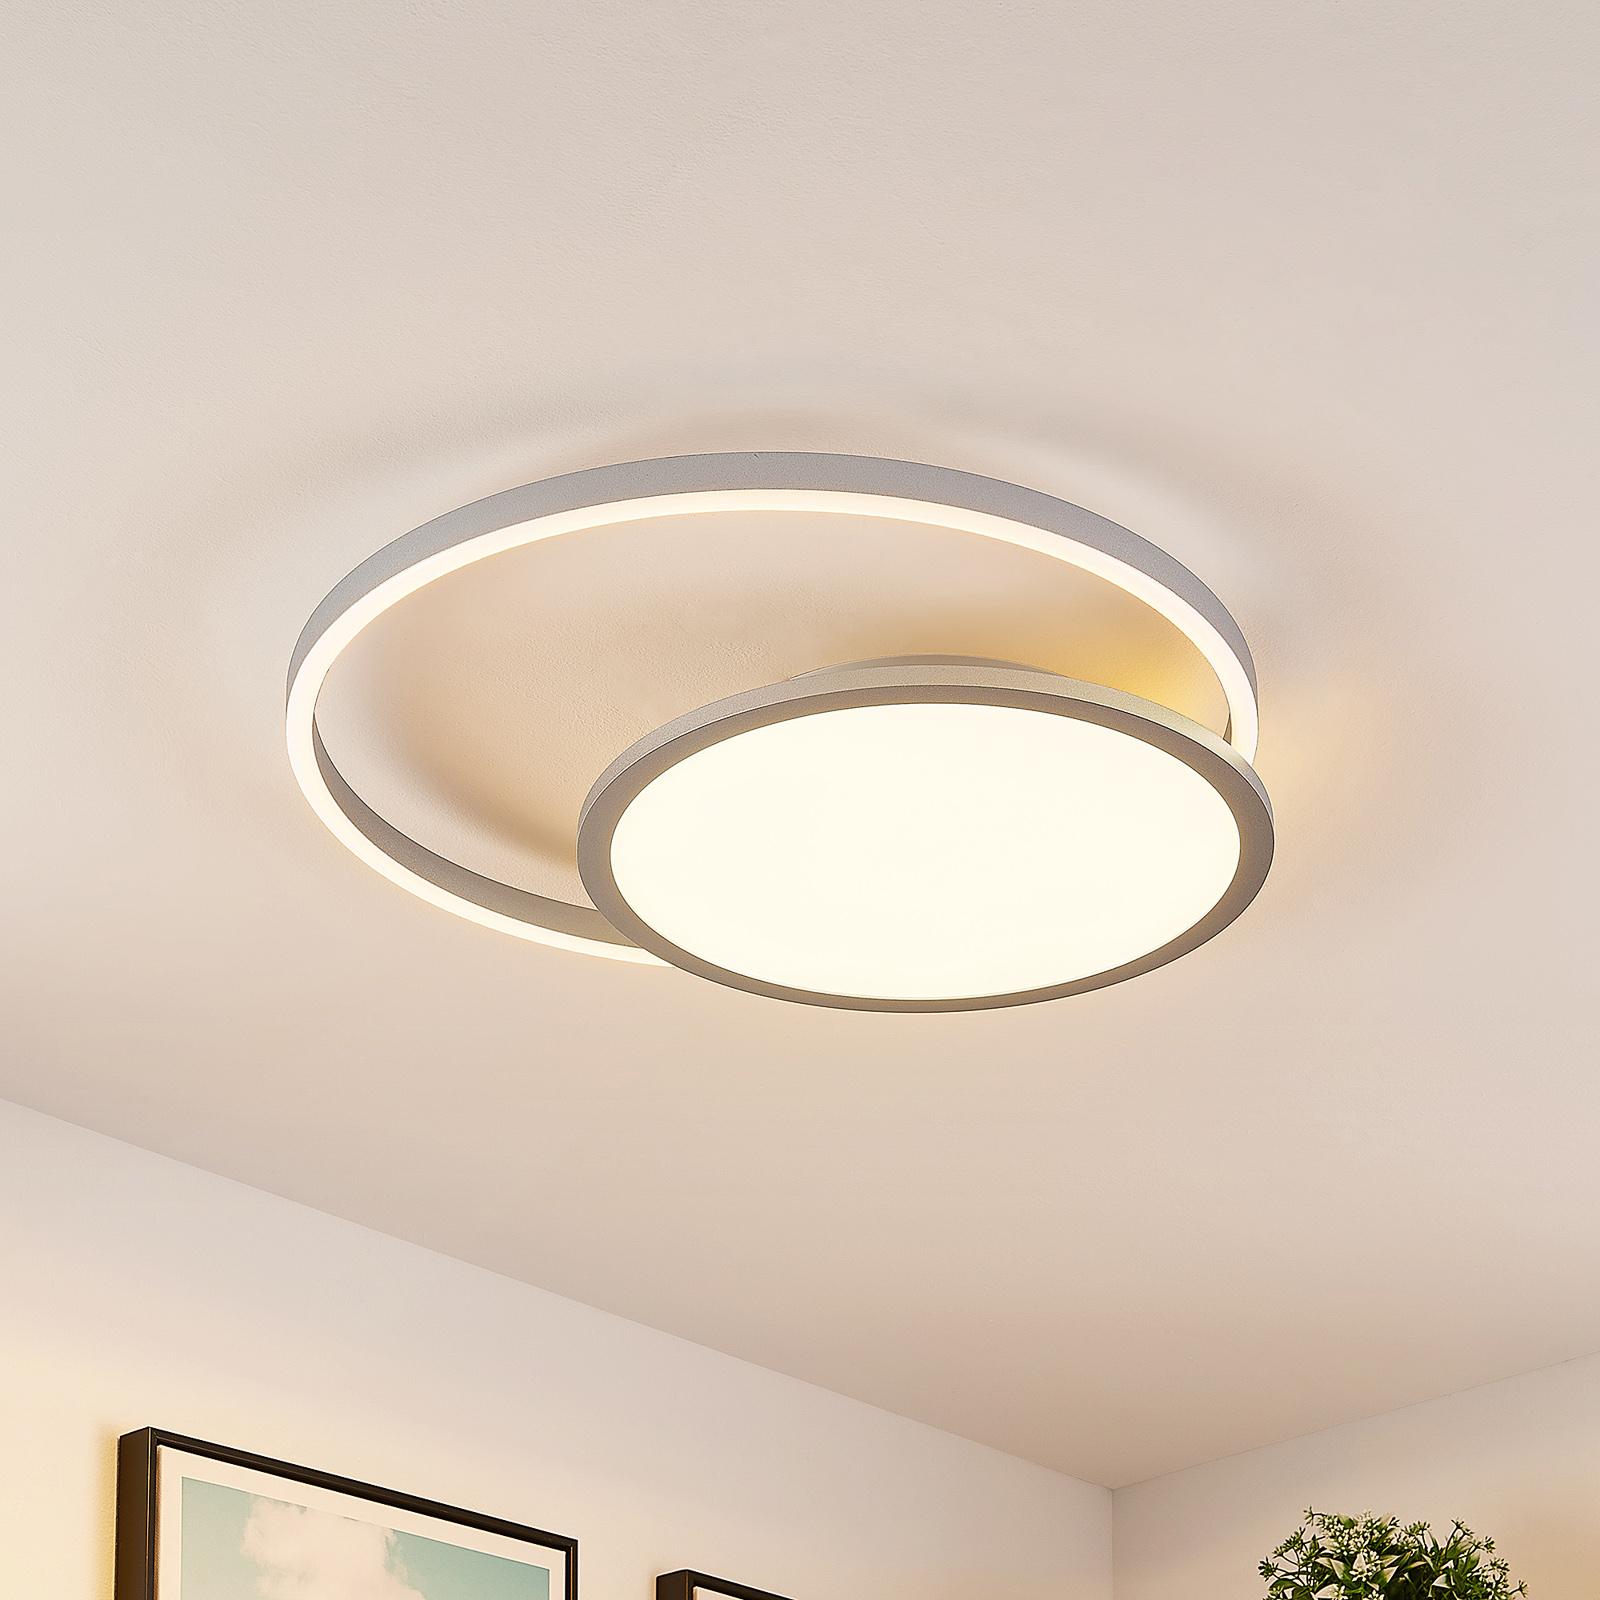 Lucande Irmi lampa sufitowa LED, CCT